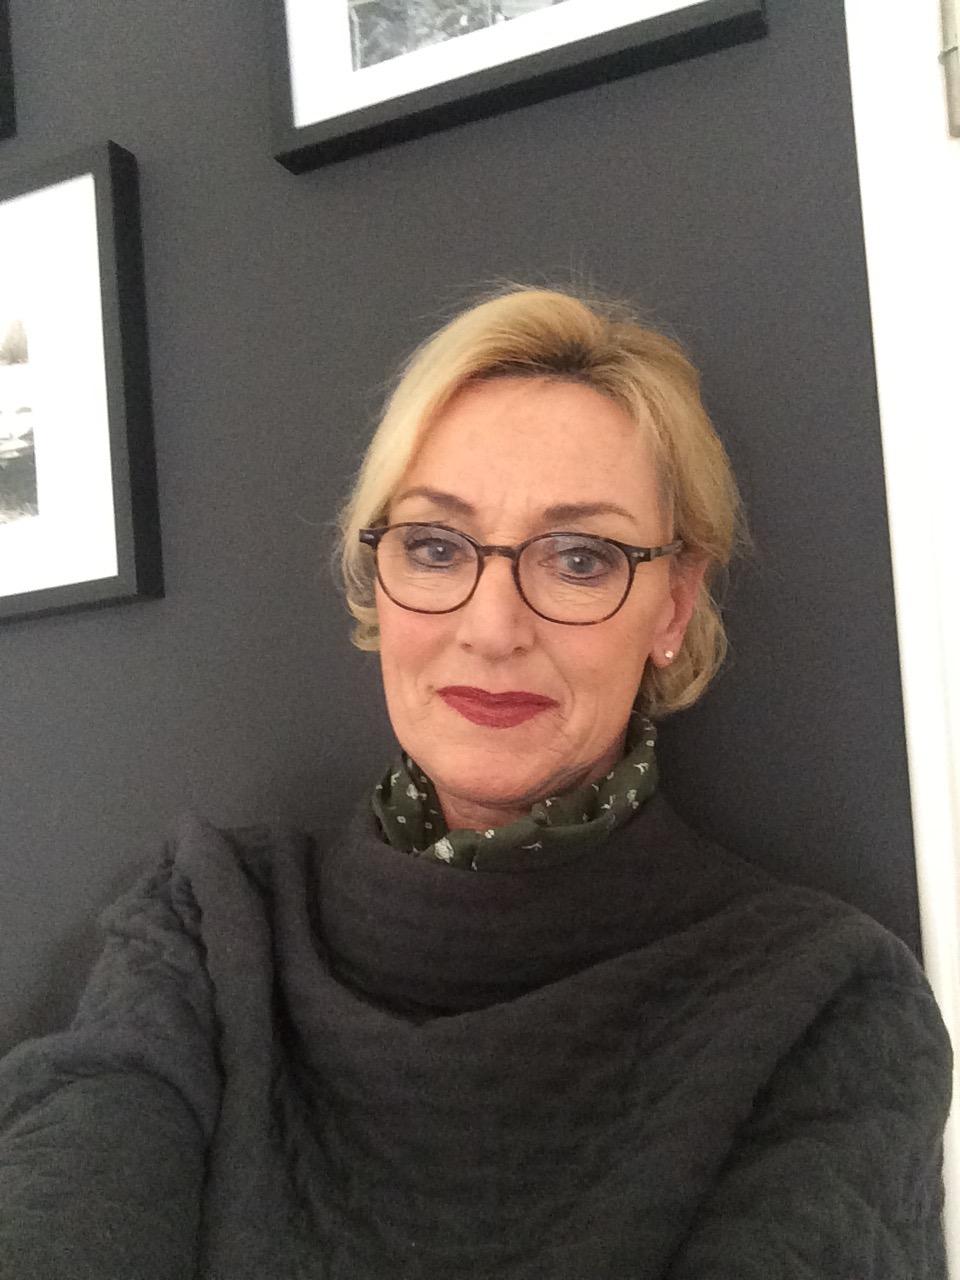 Claudia Herzig-Seider